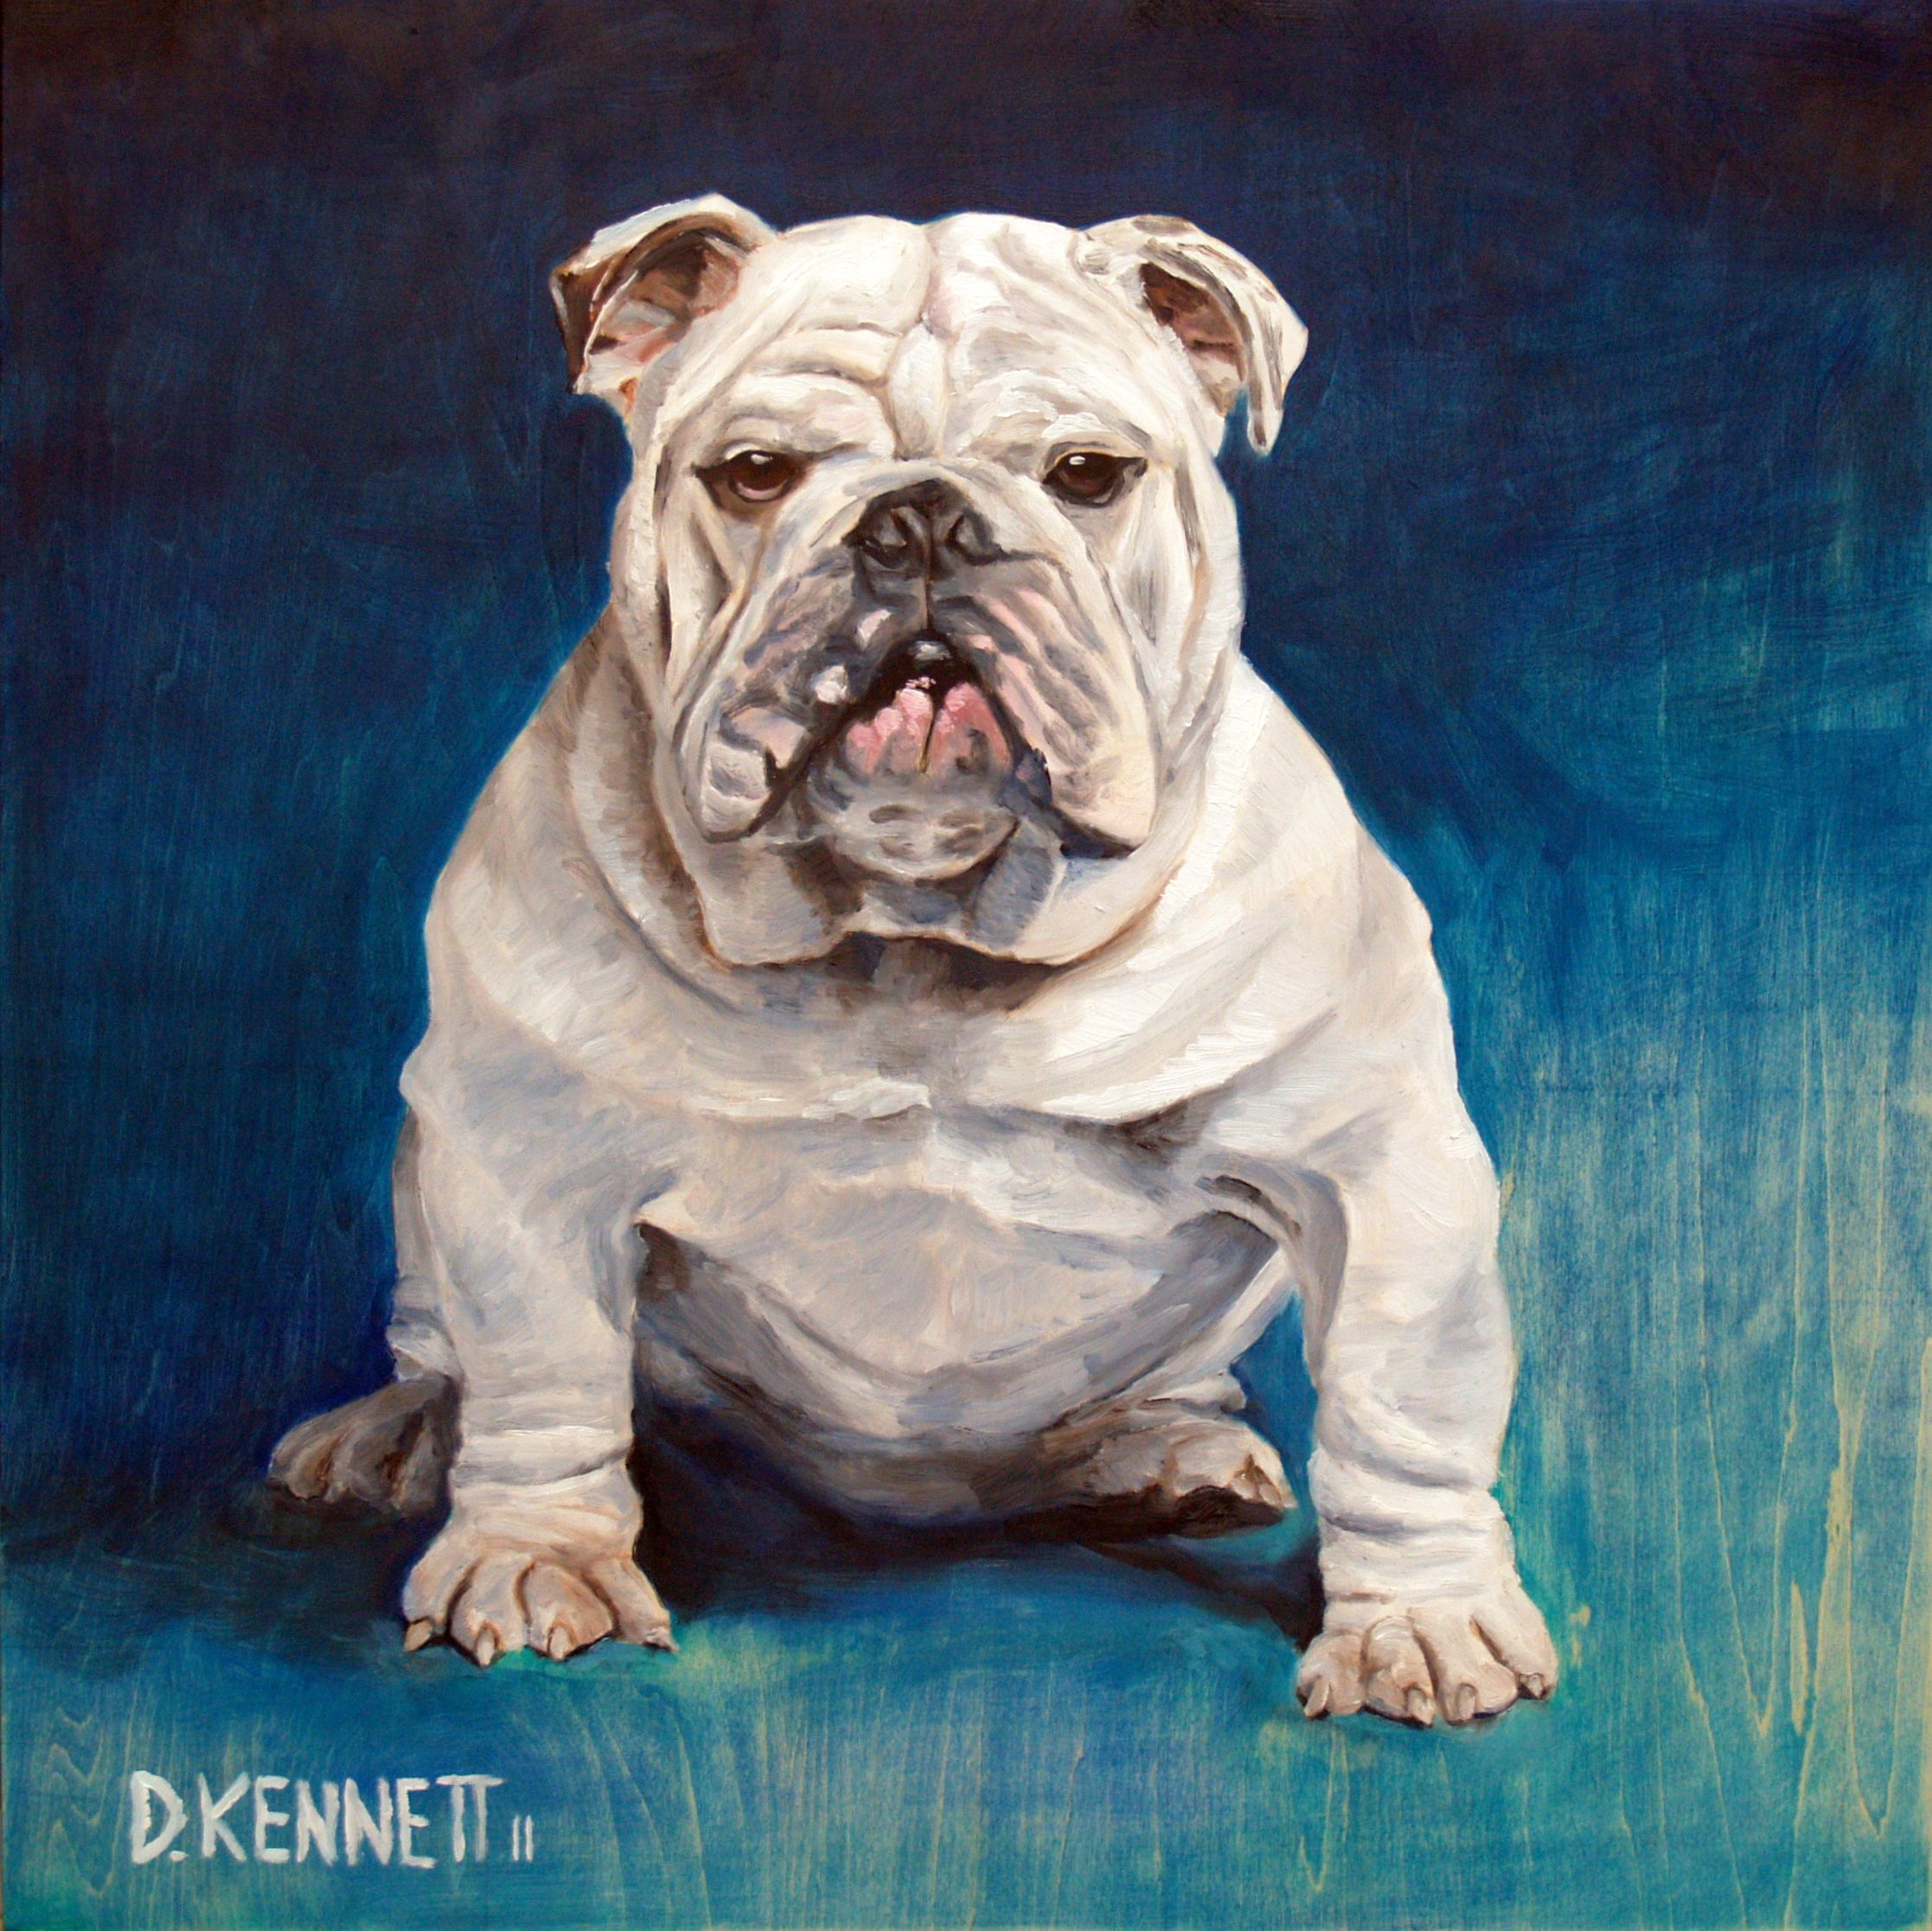 English Bulldog a custom dog portrait painting by David at